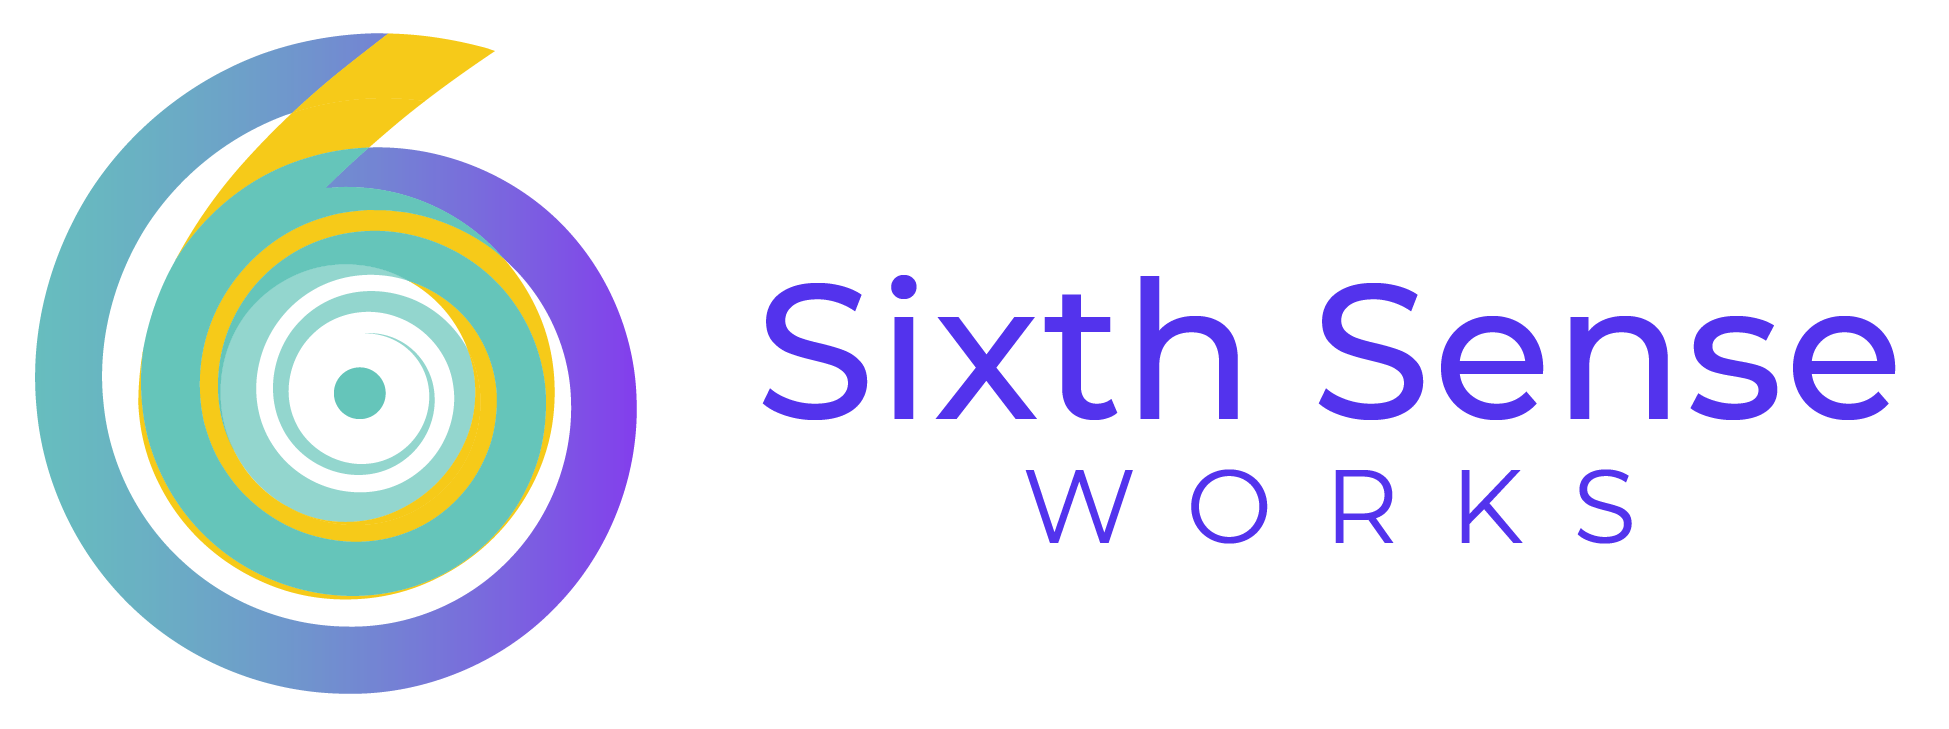 Sixth Sense Works